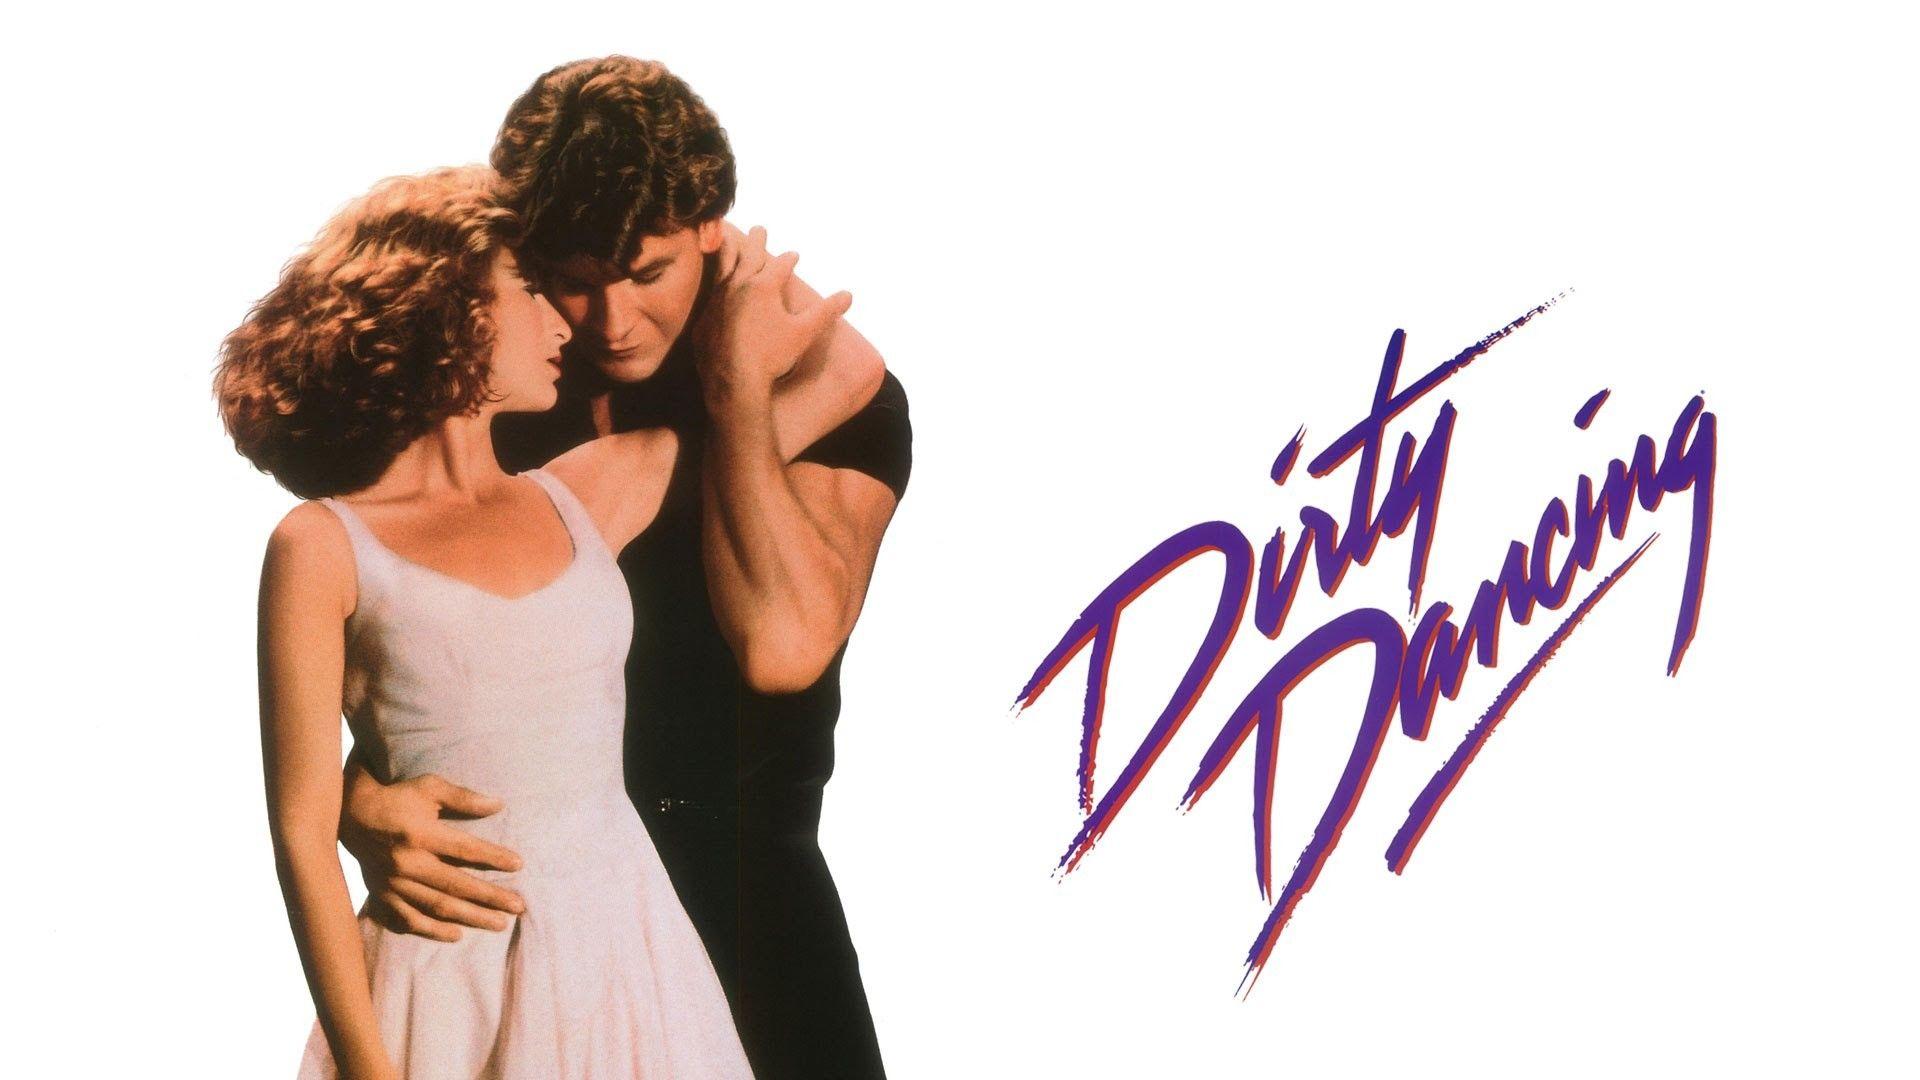 30 Dirty Dancing Desktop Wallpapers   Download at WallpaperBro 1920x1080